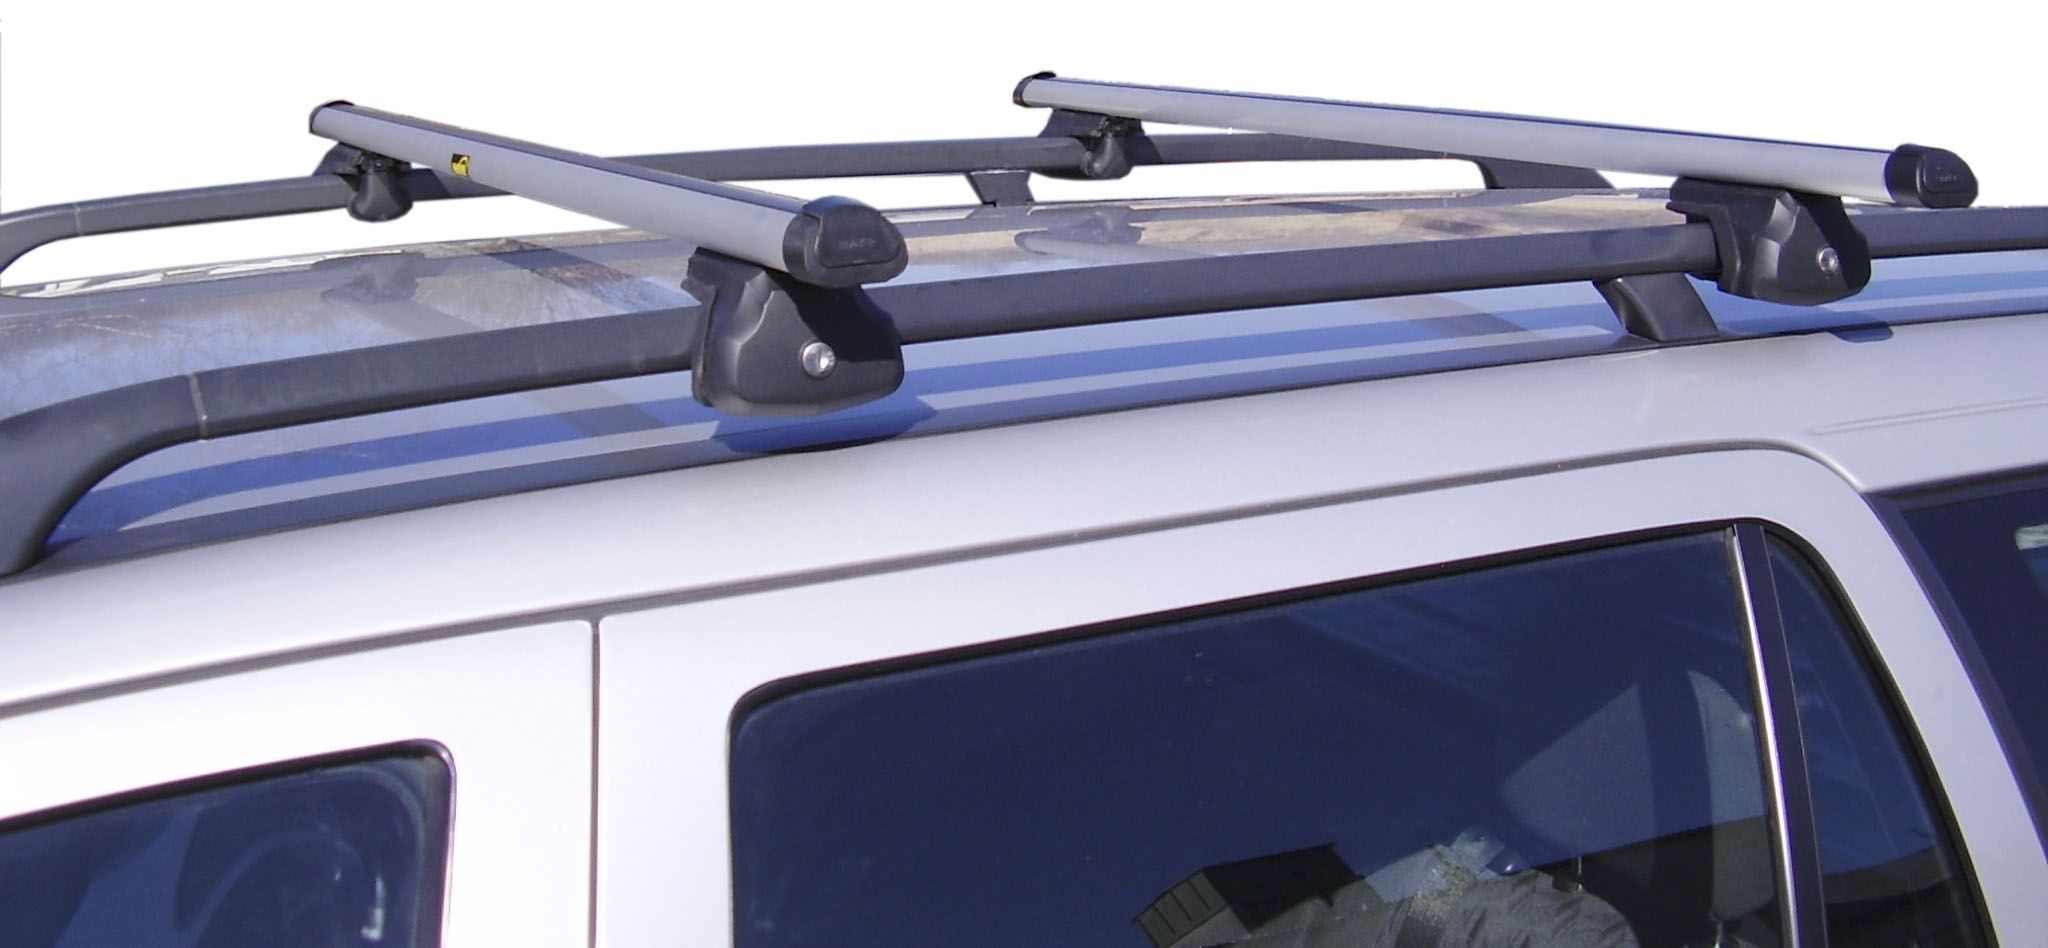 Strešný nosič HAKR 0013/0018 – ALU tyč pre SEAT Alhambra Strešný nosič HAKR HV0013